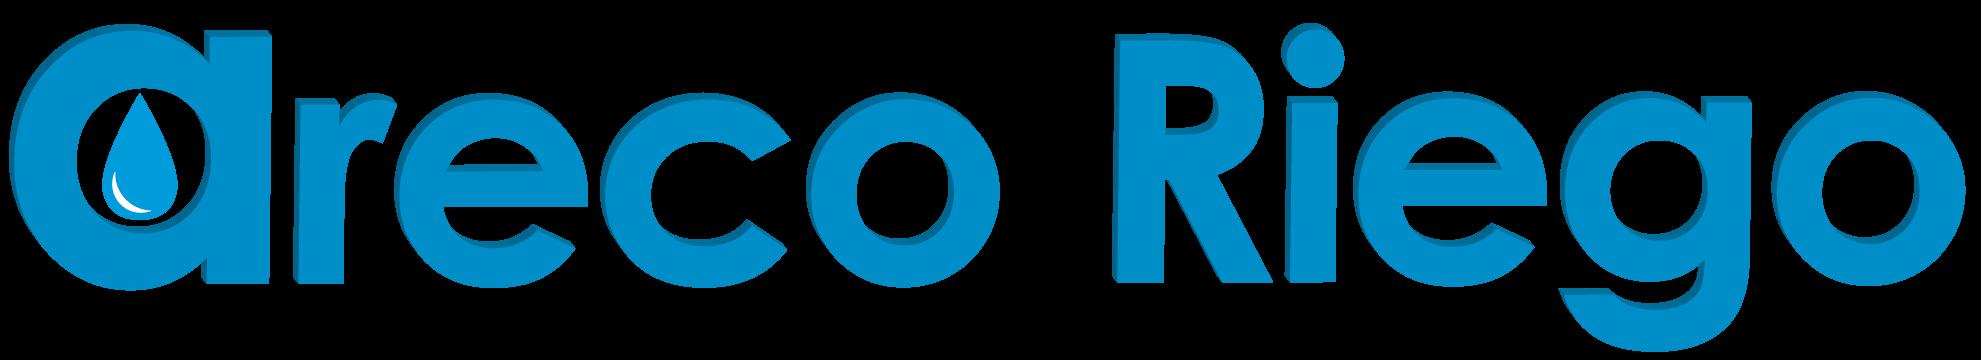 ARECO RIEGO